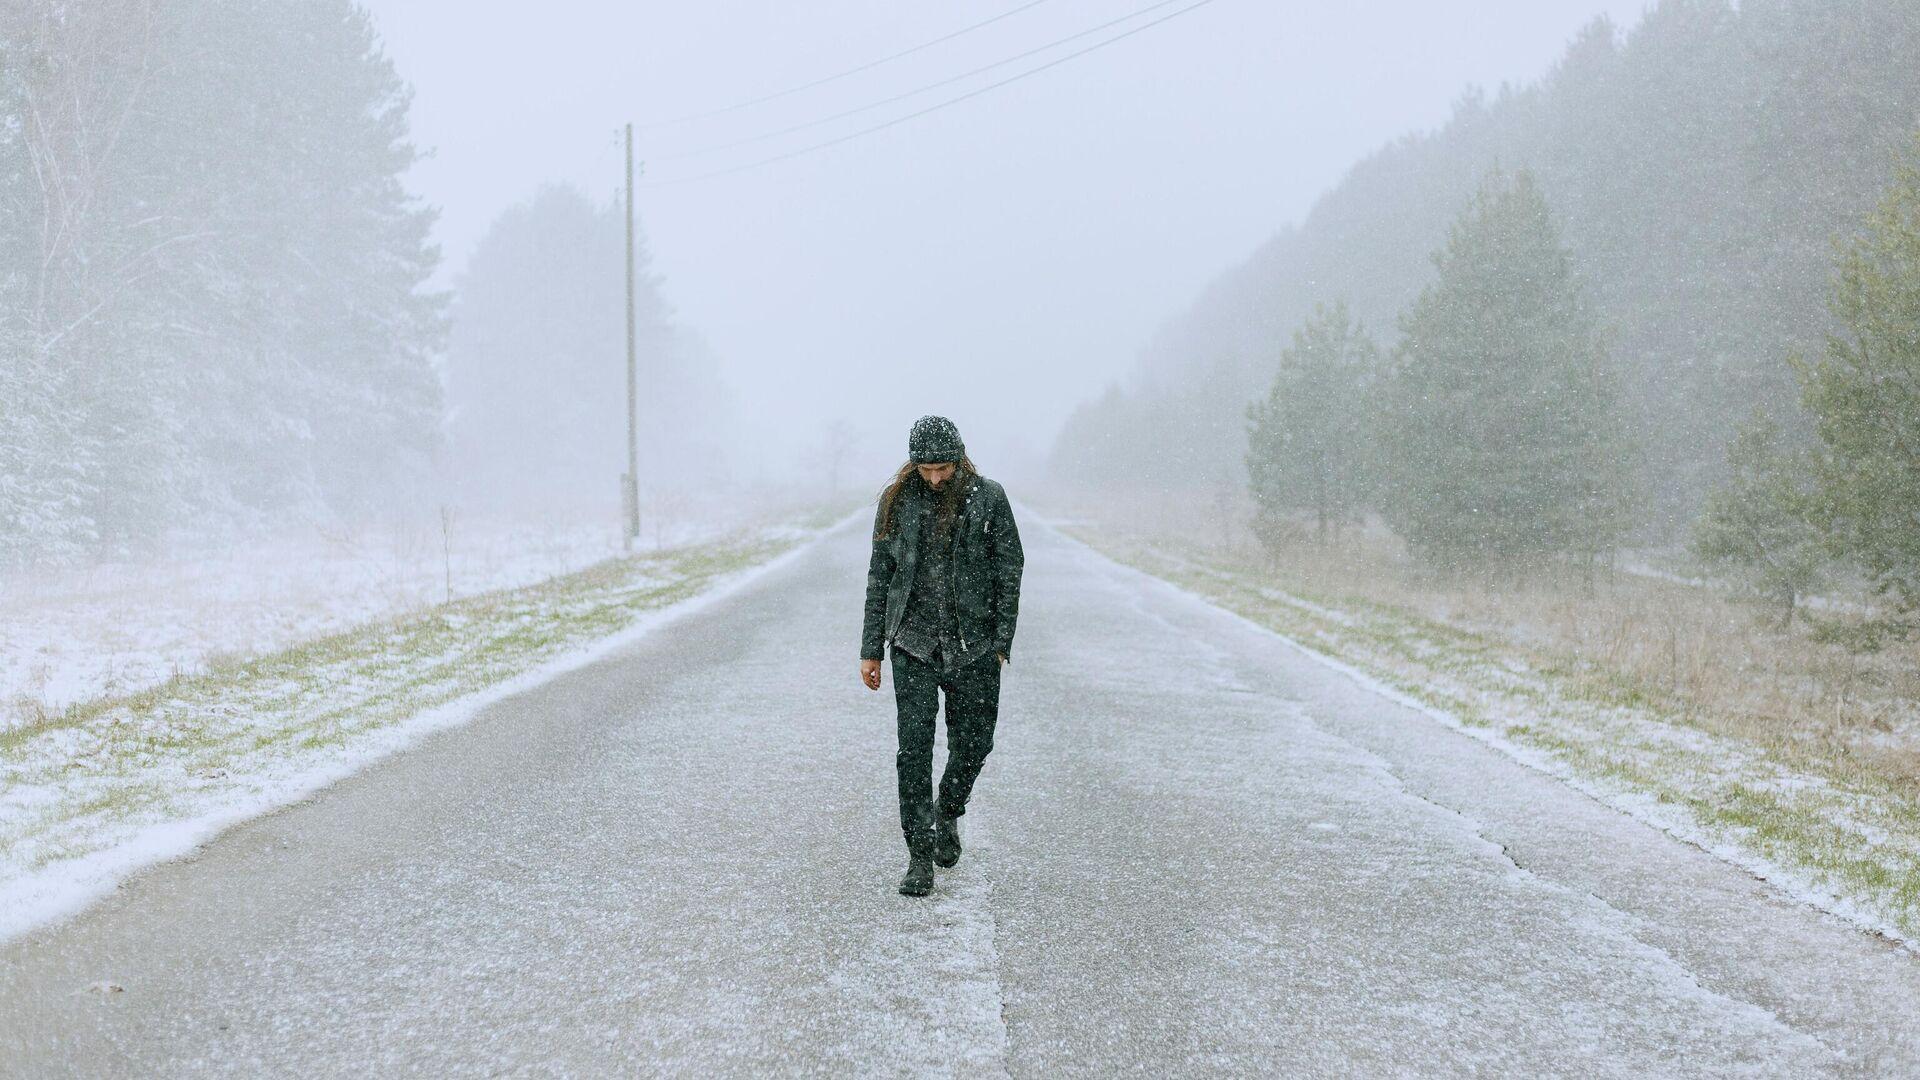 Una persona camina por una calle invernal - Sputnik Mundo, 1920, 25.03.2021